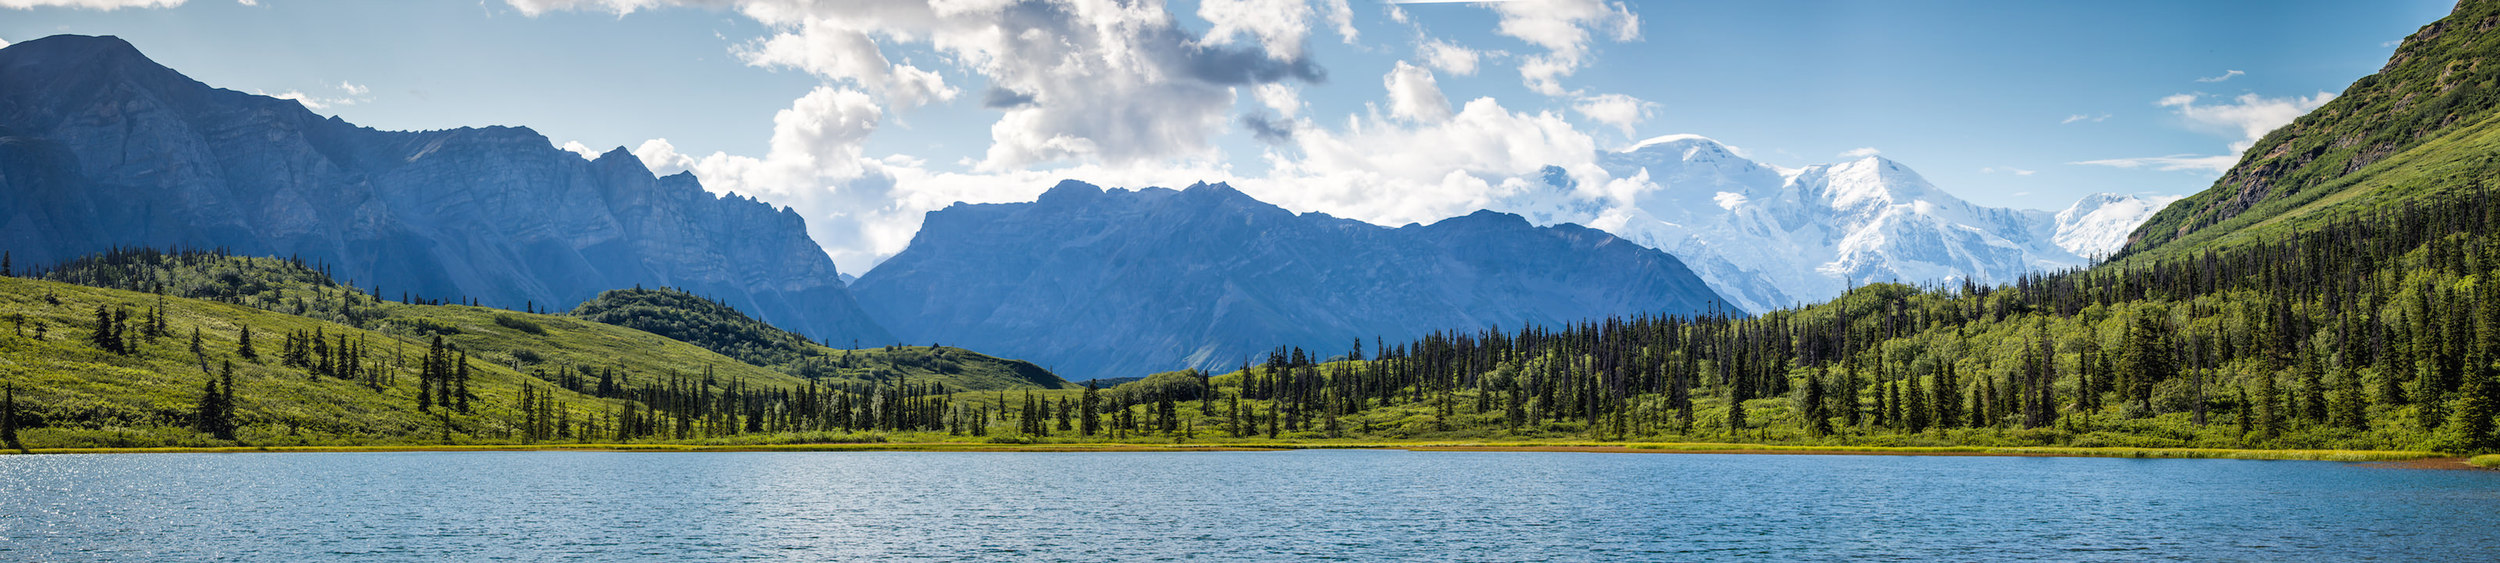 FIRST LAKE & MOUNT BLACKBURN -(PHOTO: NPS/ NEAL HERBERT)